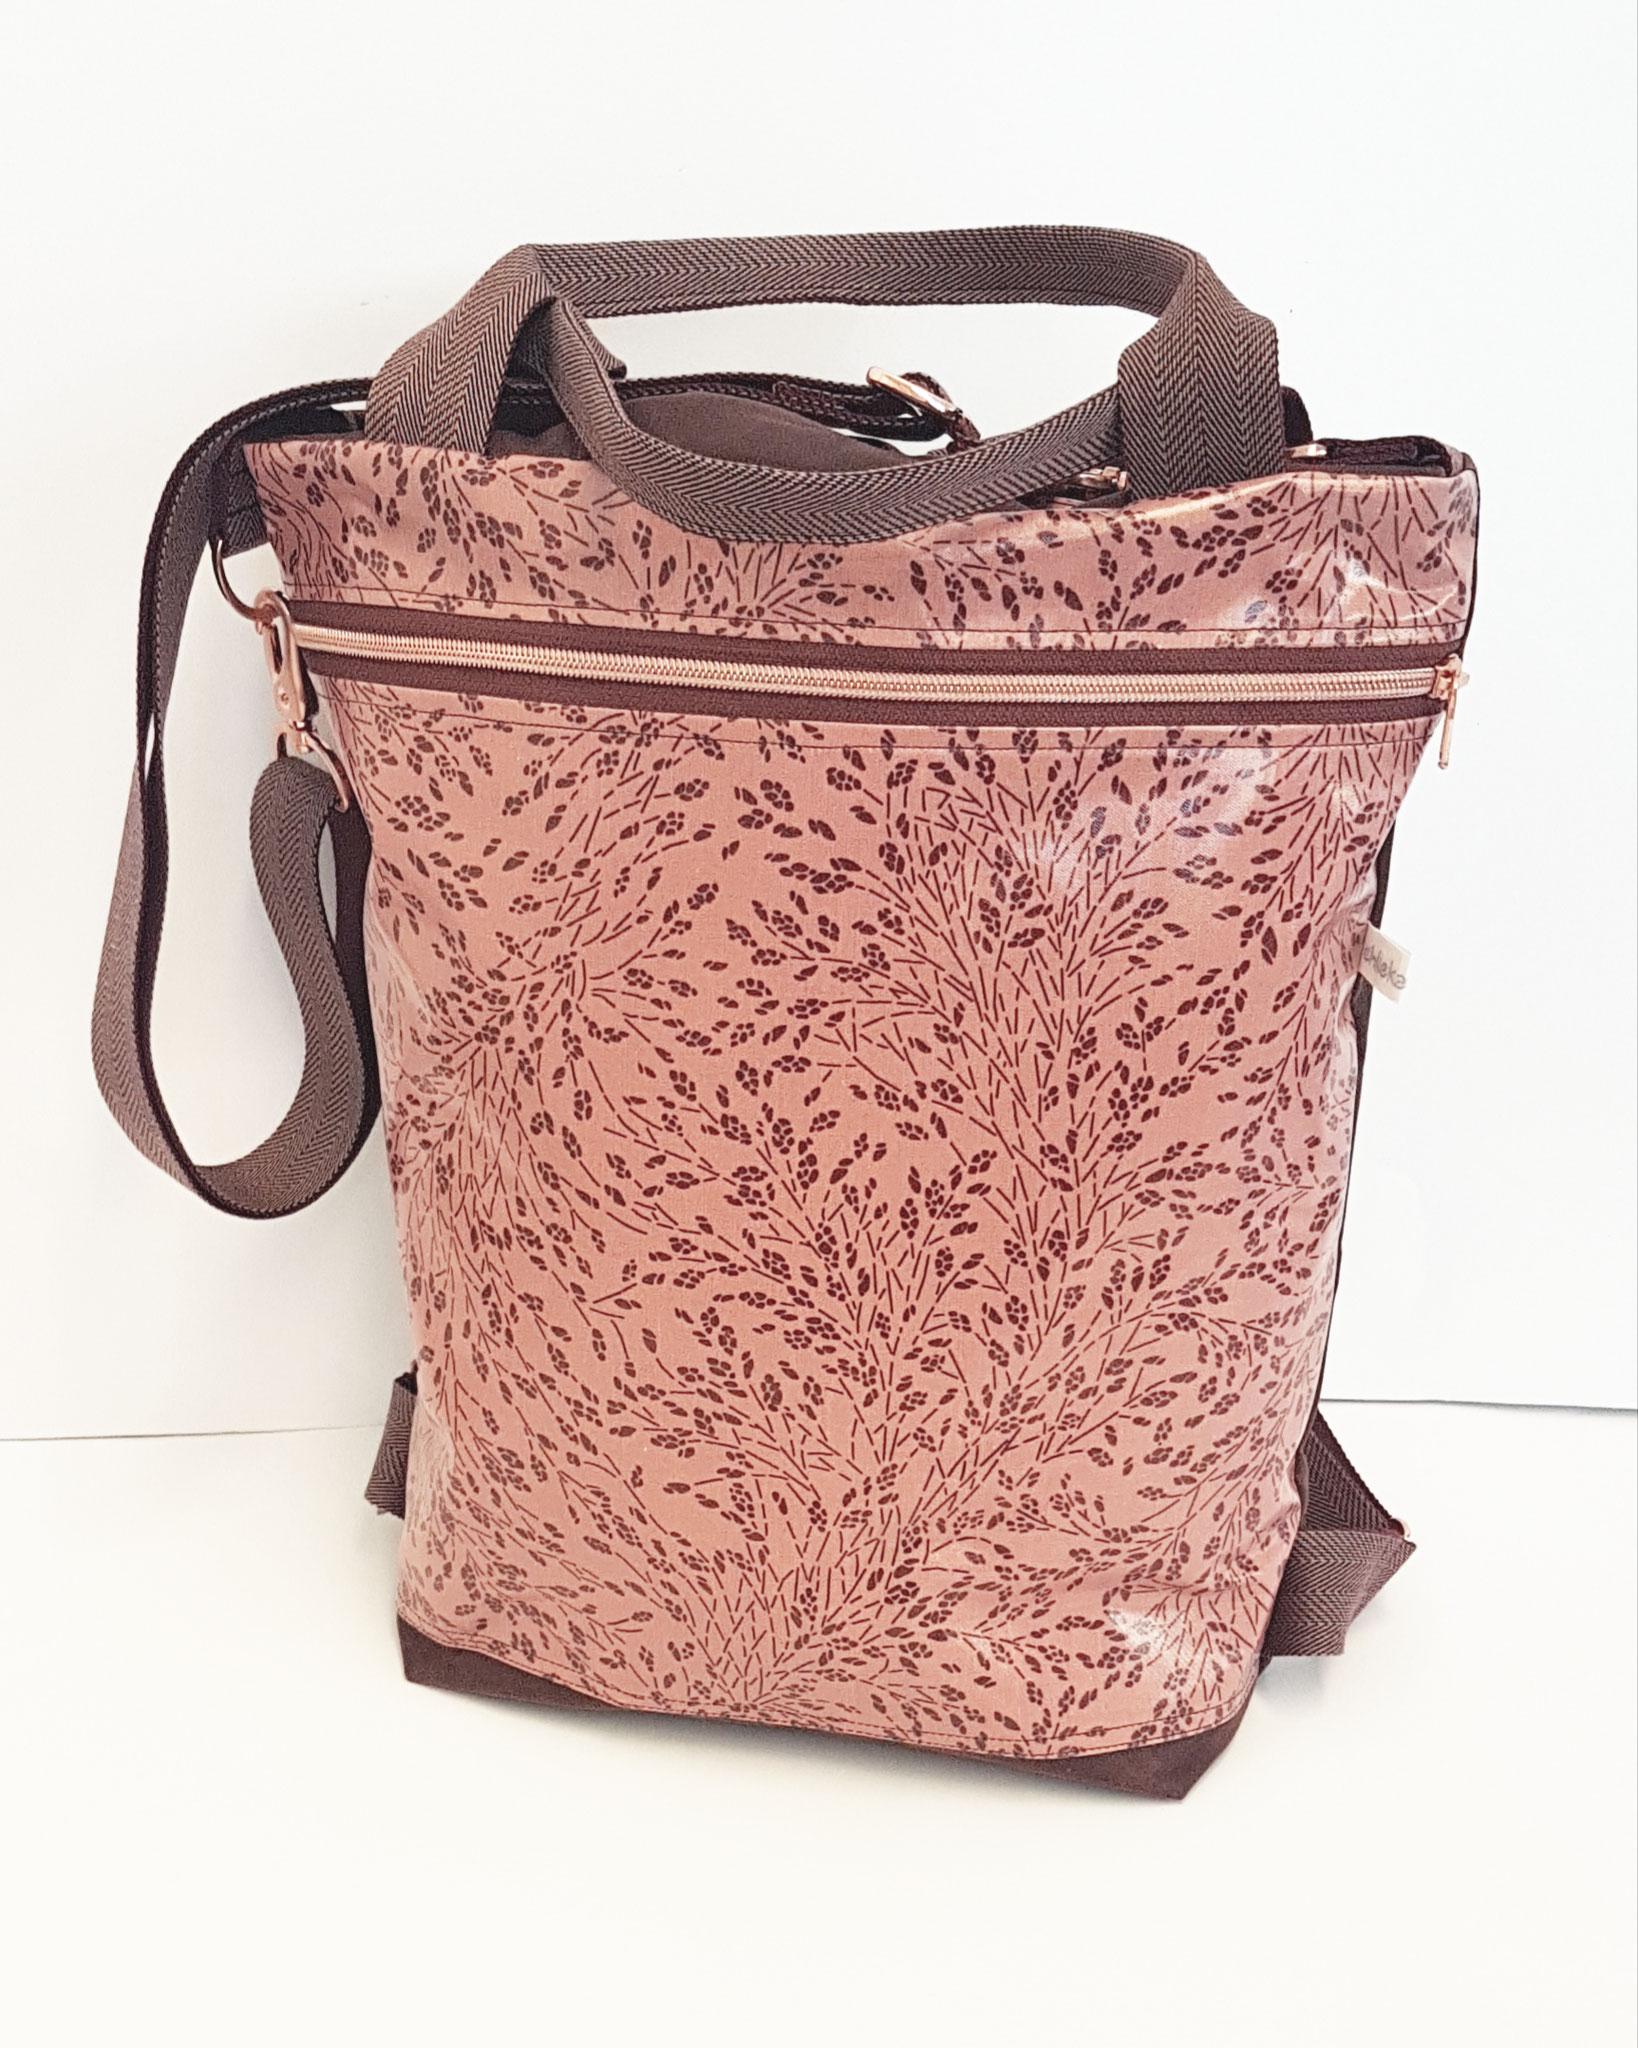 3in1 Bag L, Fr. 185.-